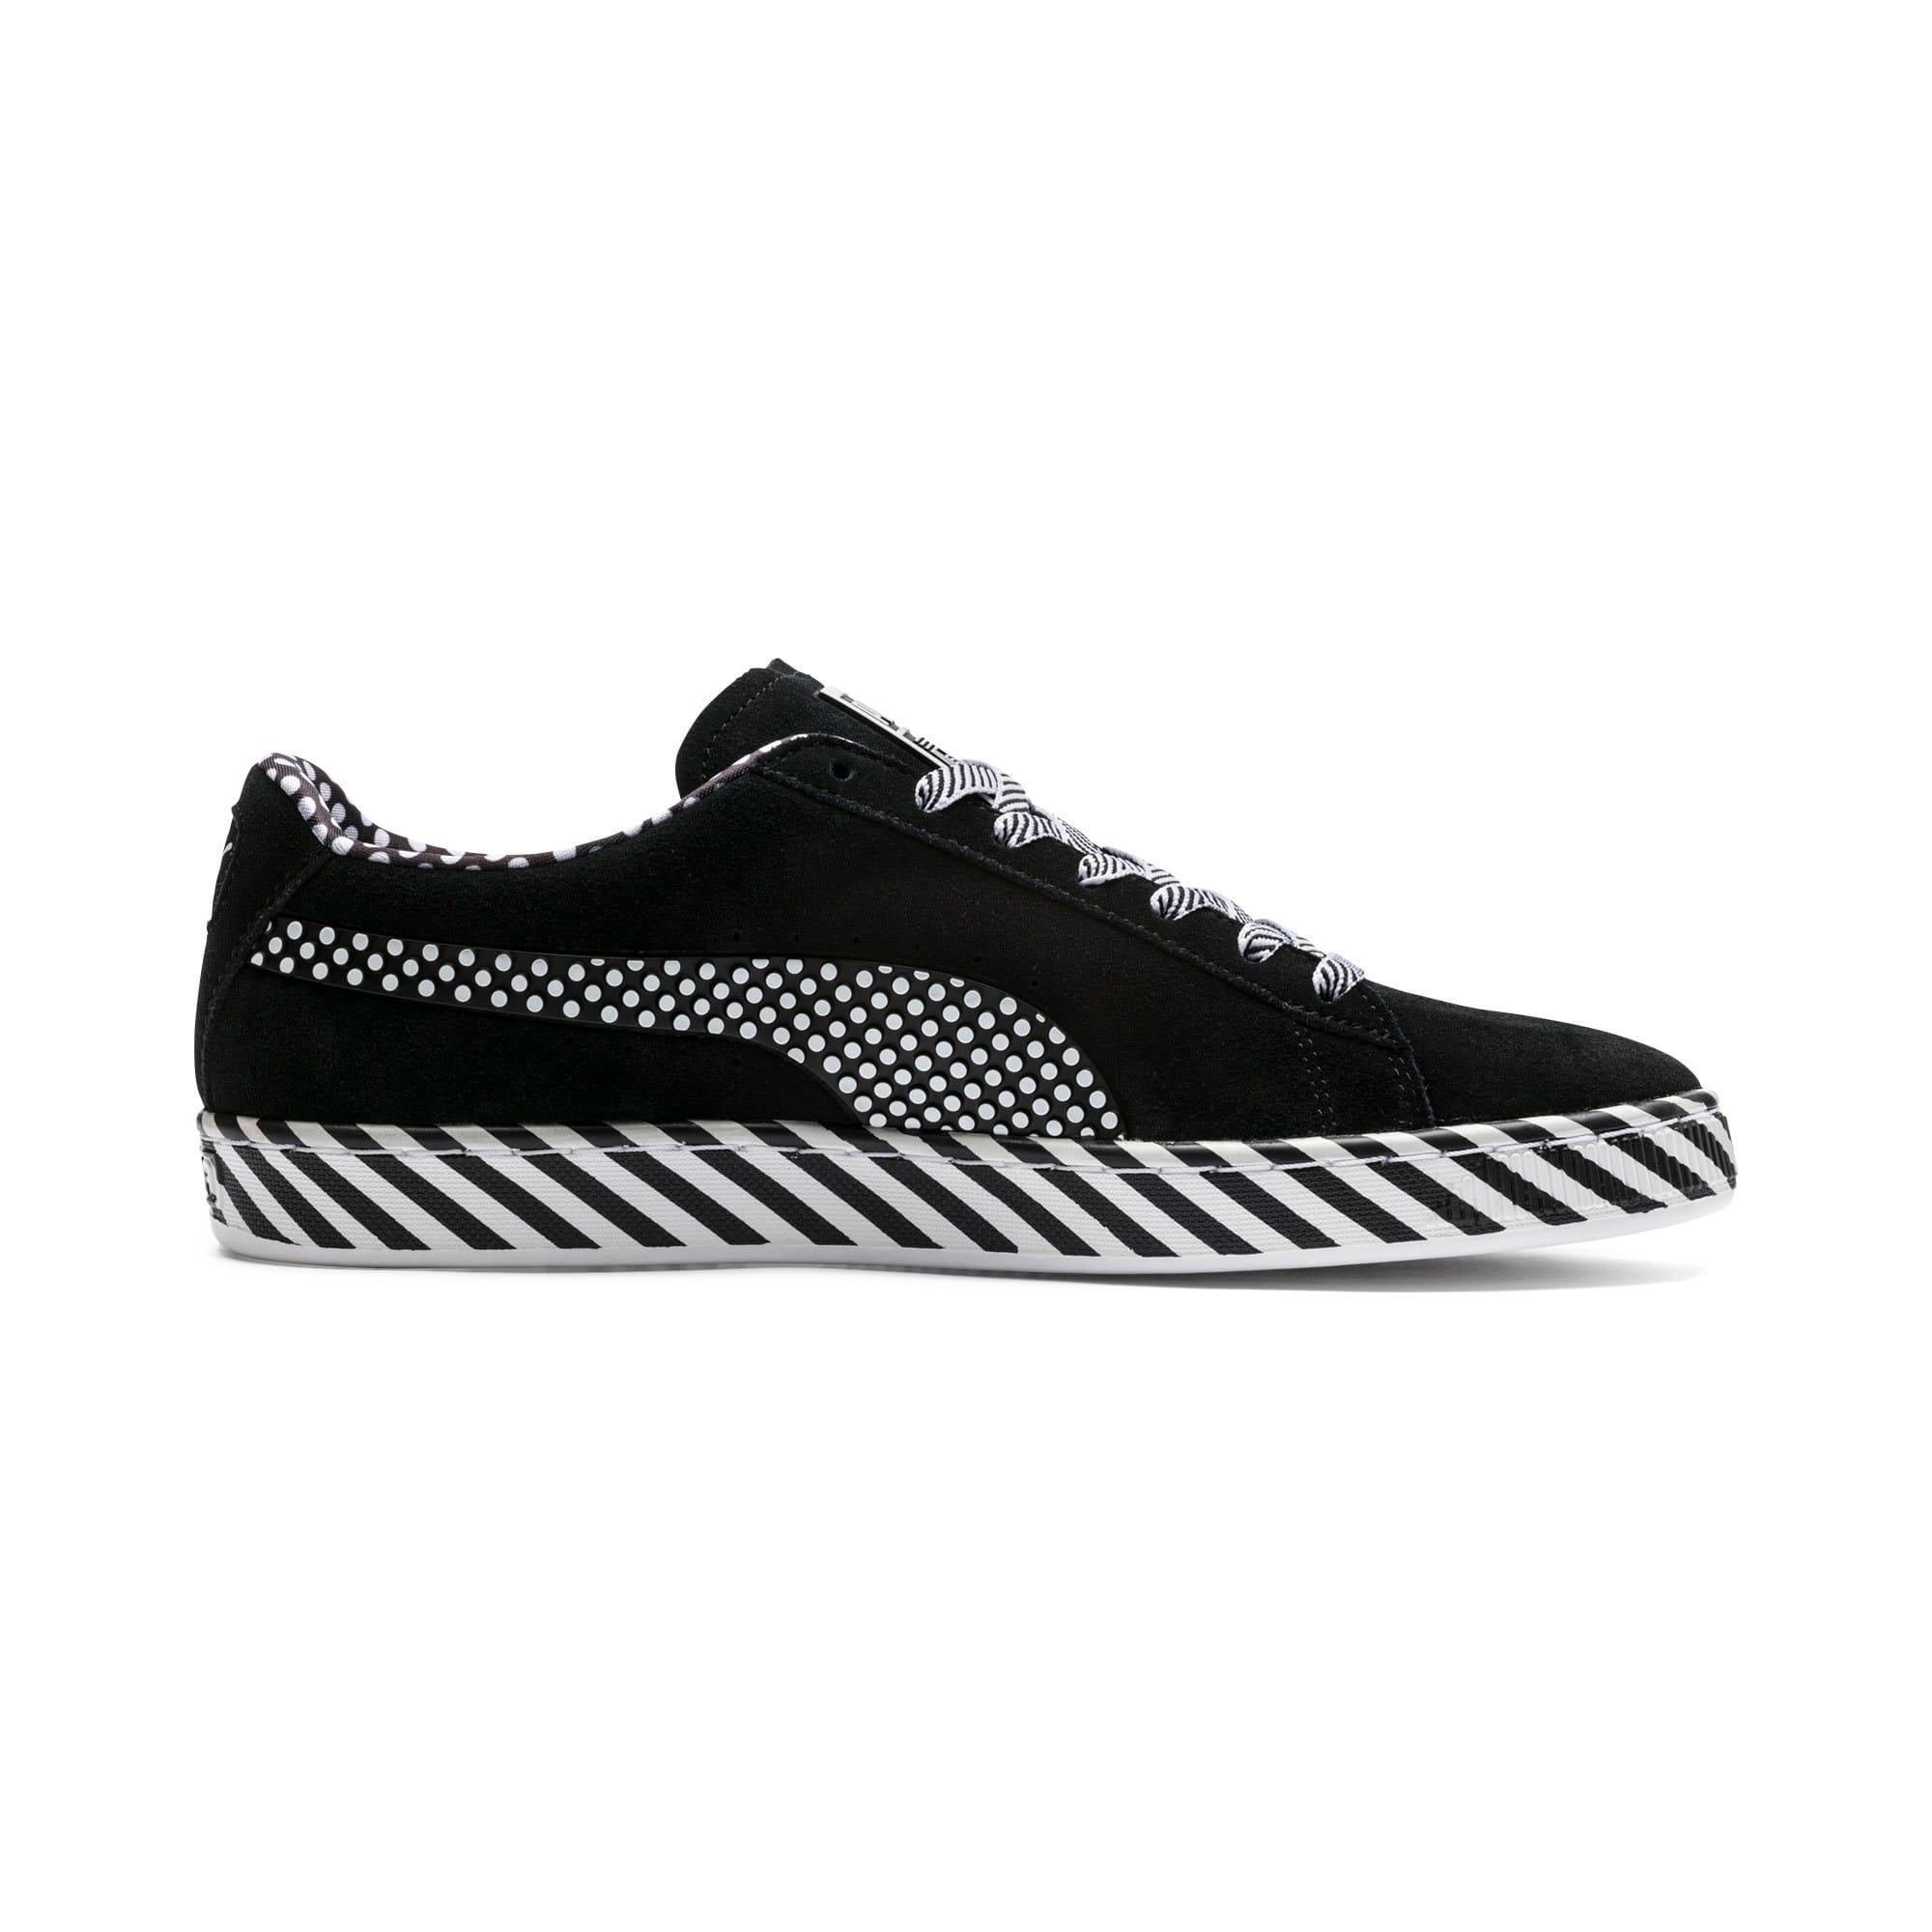 Thumbnail 5 of Suede Classic Pop Culture Sneakers, Puma Black-Puma White, medium